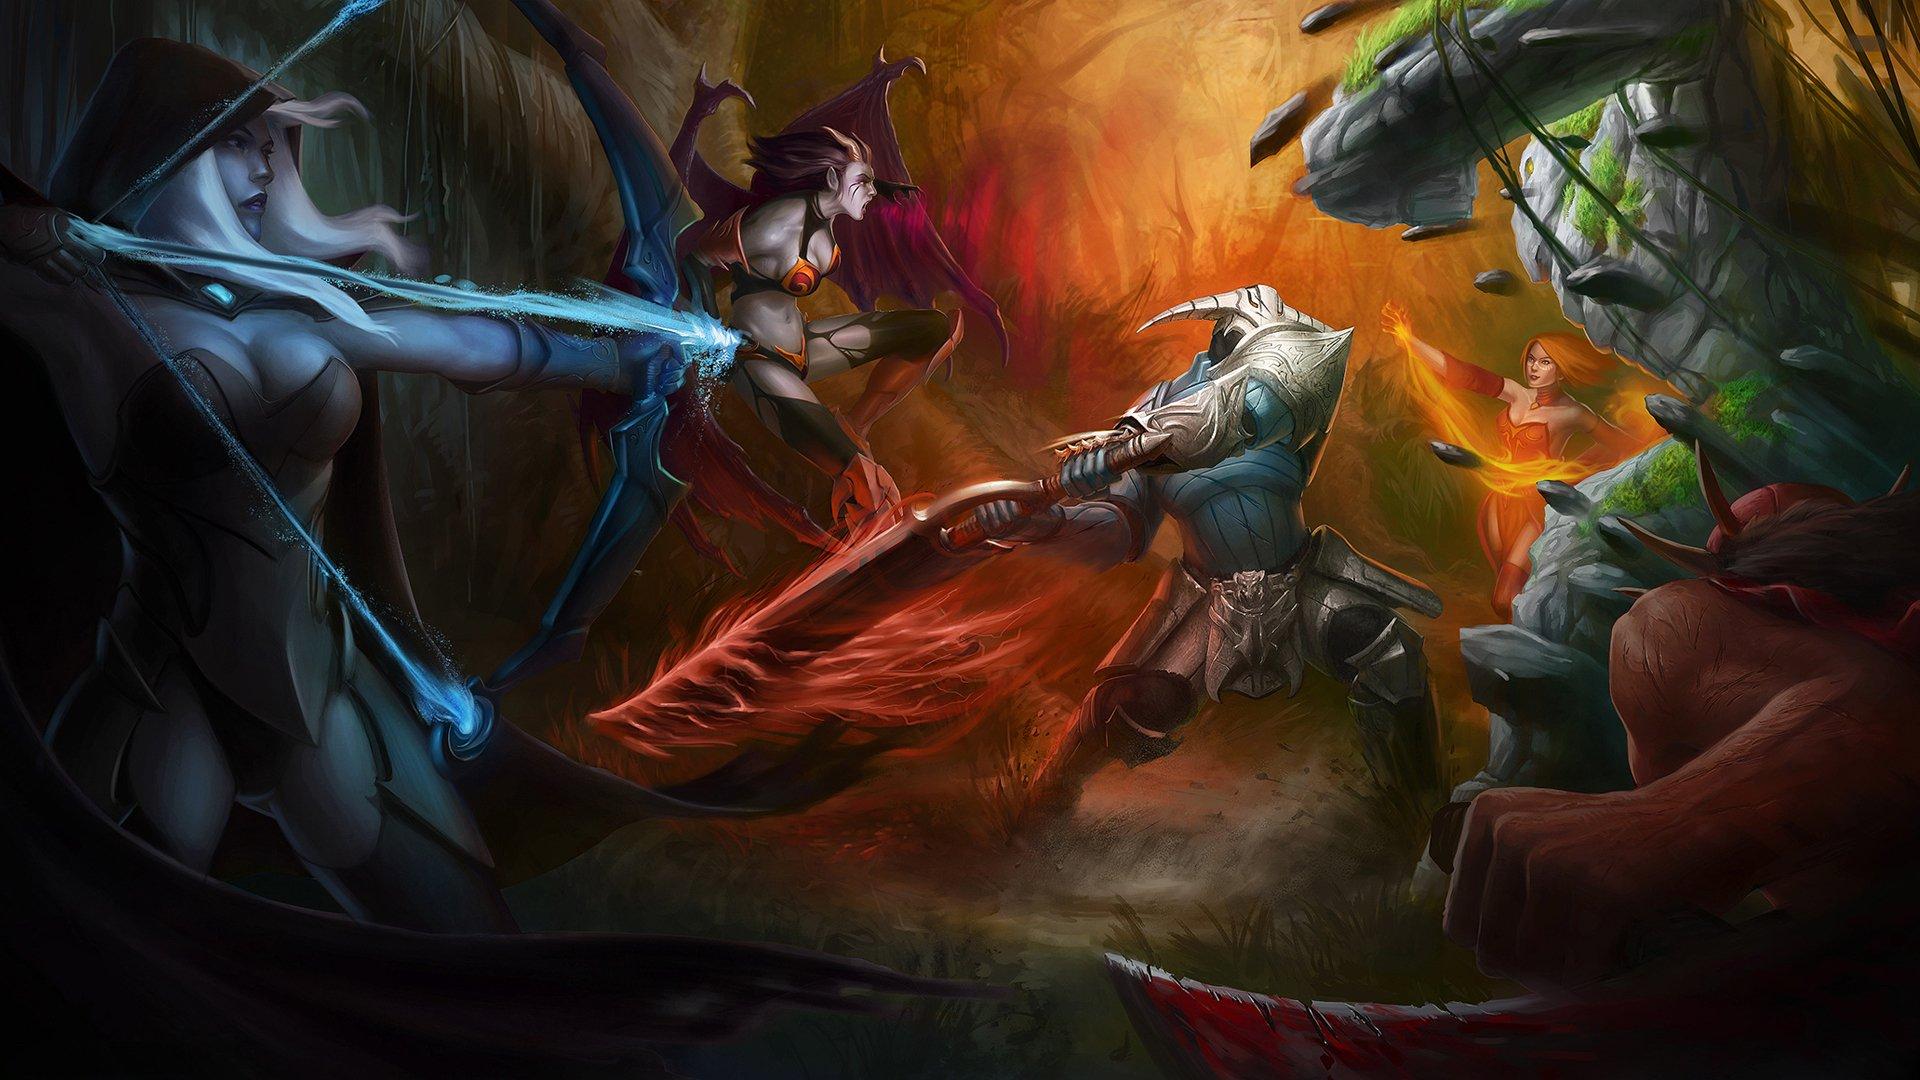 Dota 2 Battle Warrior Monster Sven Drow Ranger Lina Bloodseeker